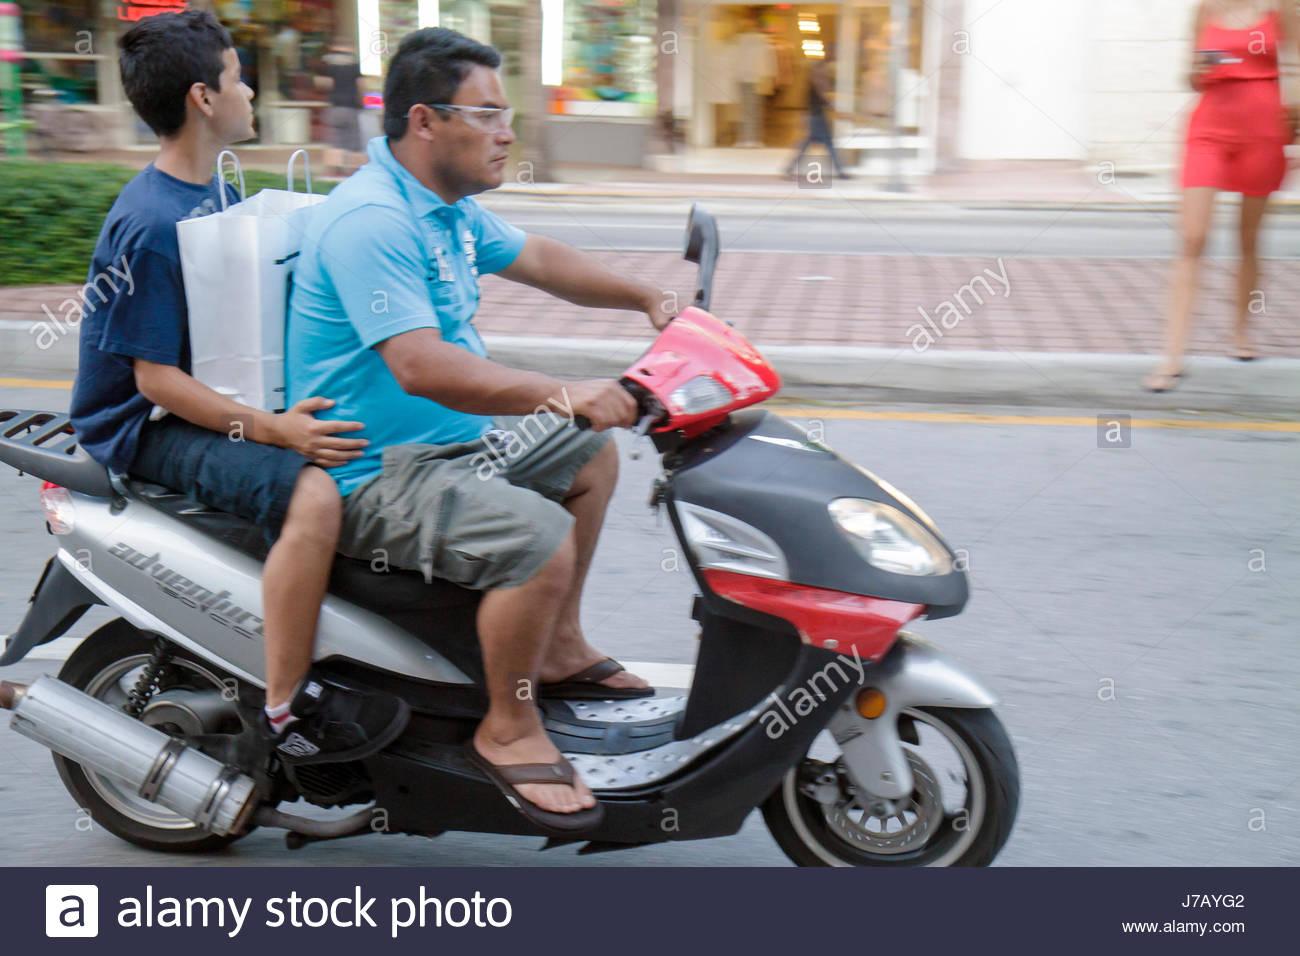 Miami Beach Florida Washington Avenue Hispanic man father boy son passenger moving motor scooter speed motion no - Stock Image